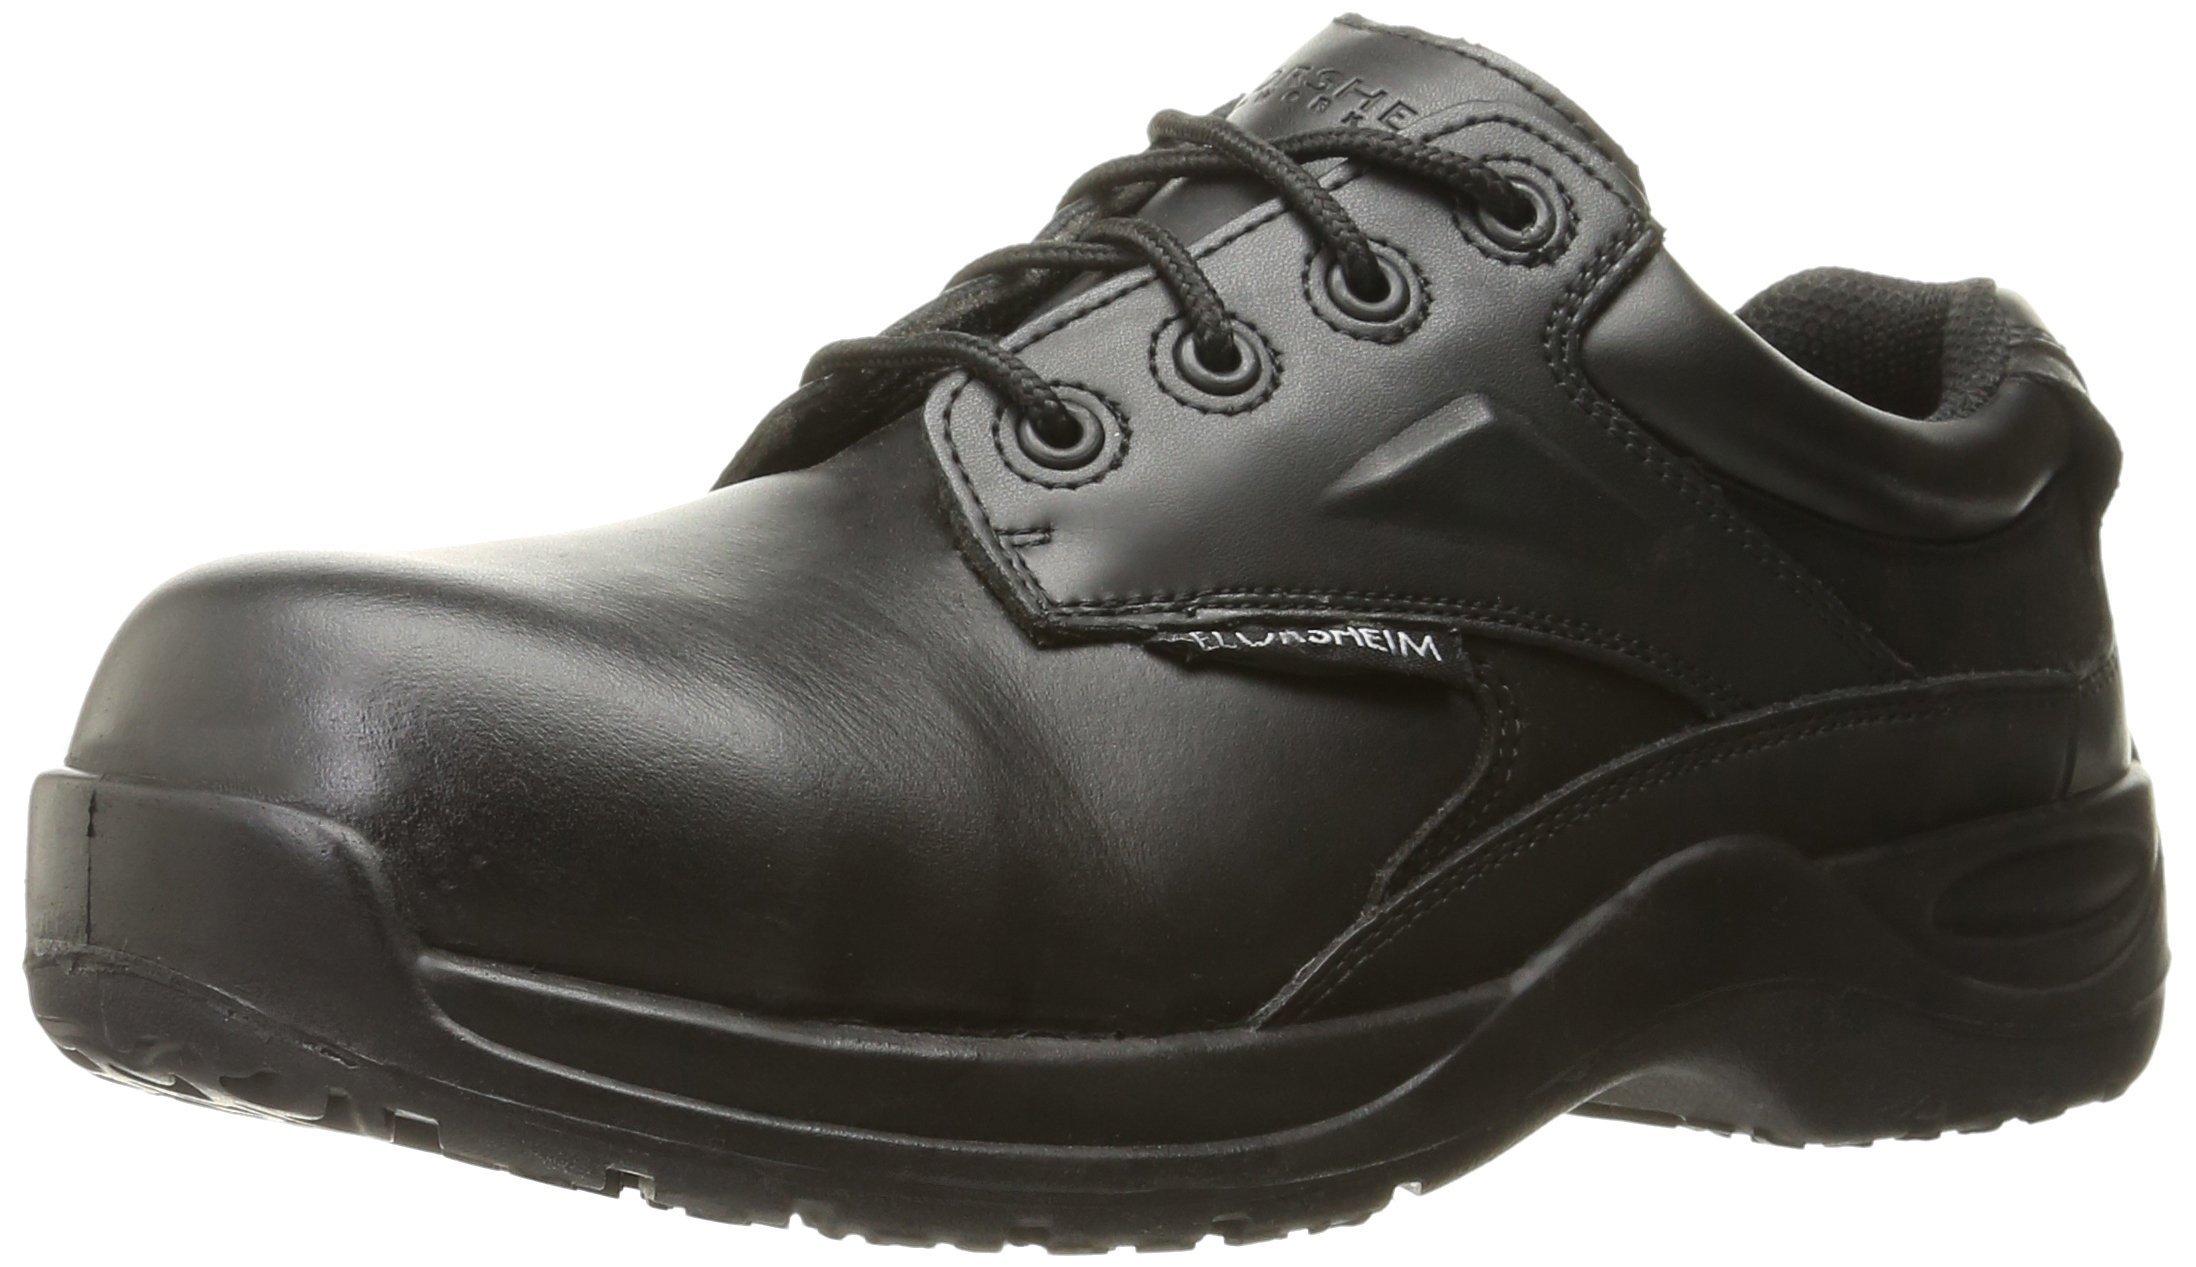 Florsheim Work Men's Vaquero FS2716 Work Shoe, Black, 13 D US